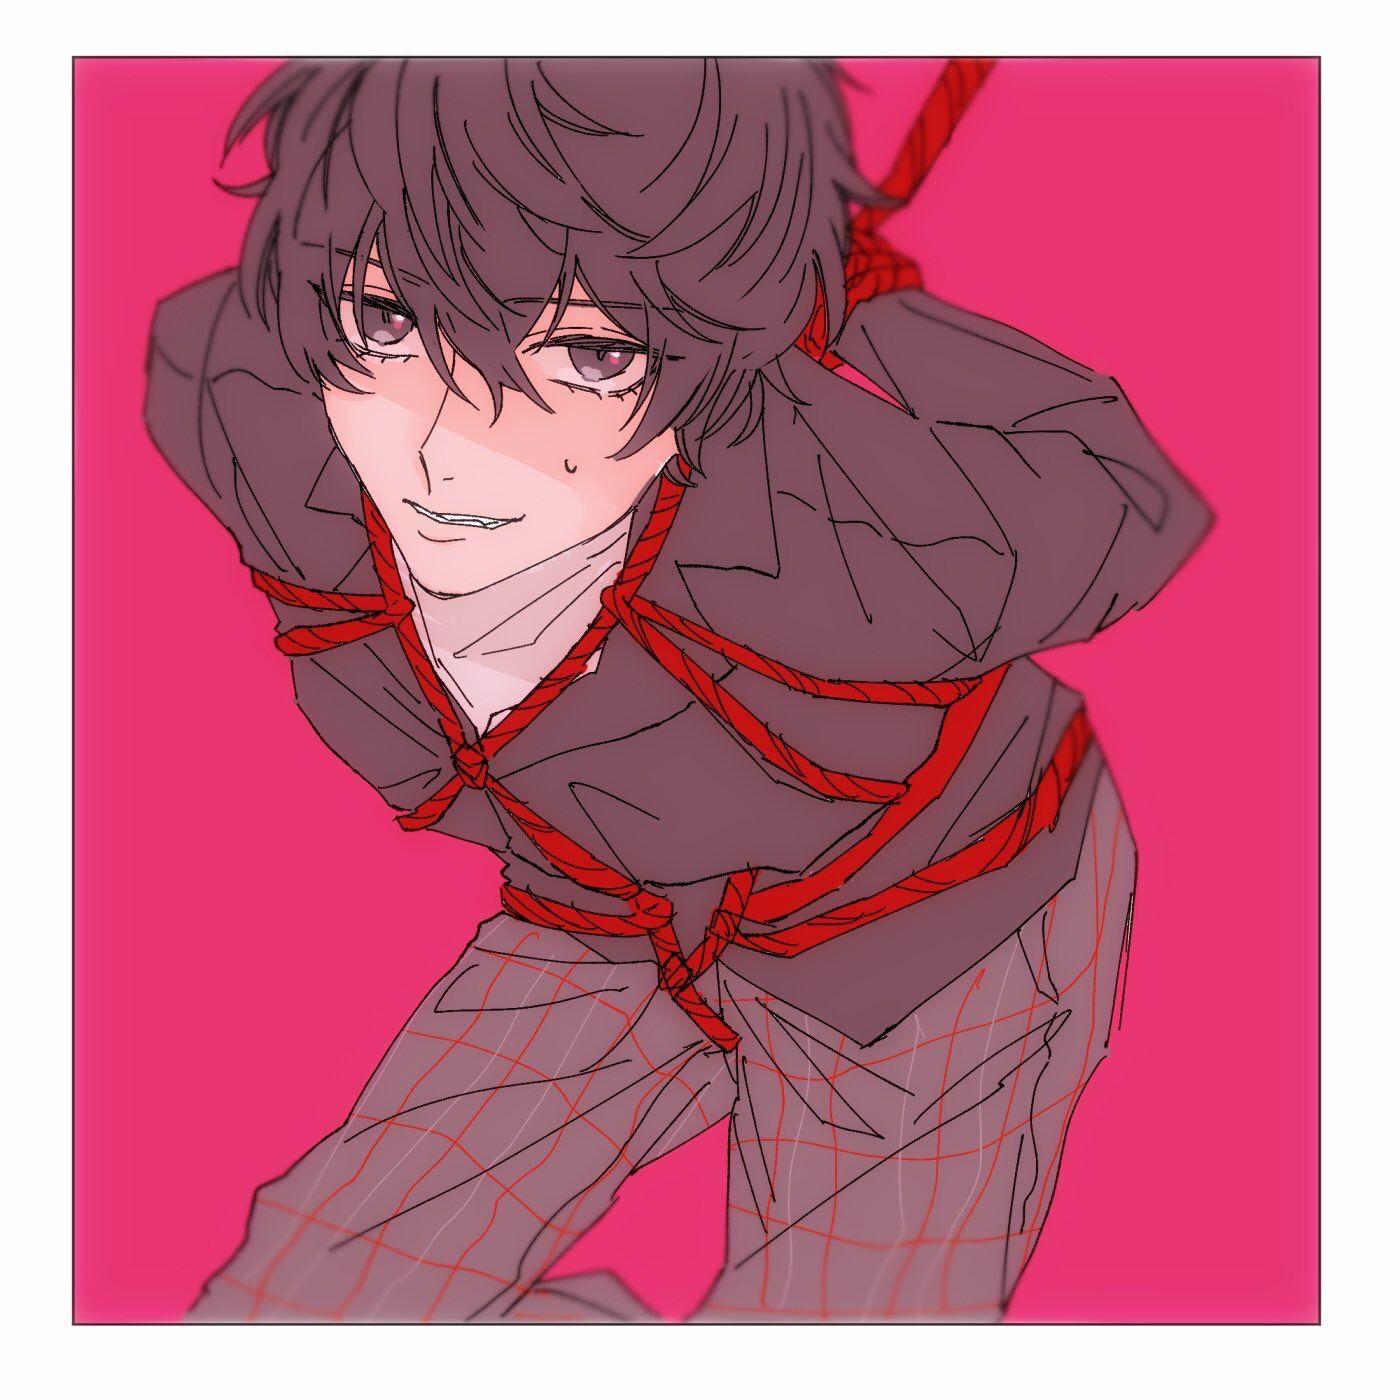 Ah Nao Ne Poha Persona 5 Anime Persona 5 Joker Akira Kurusu